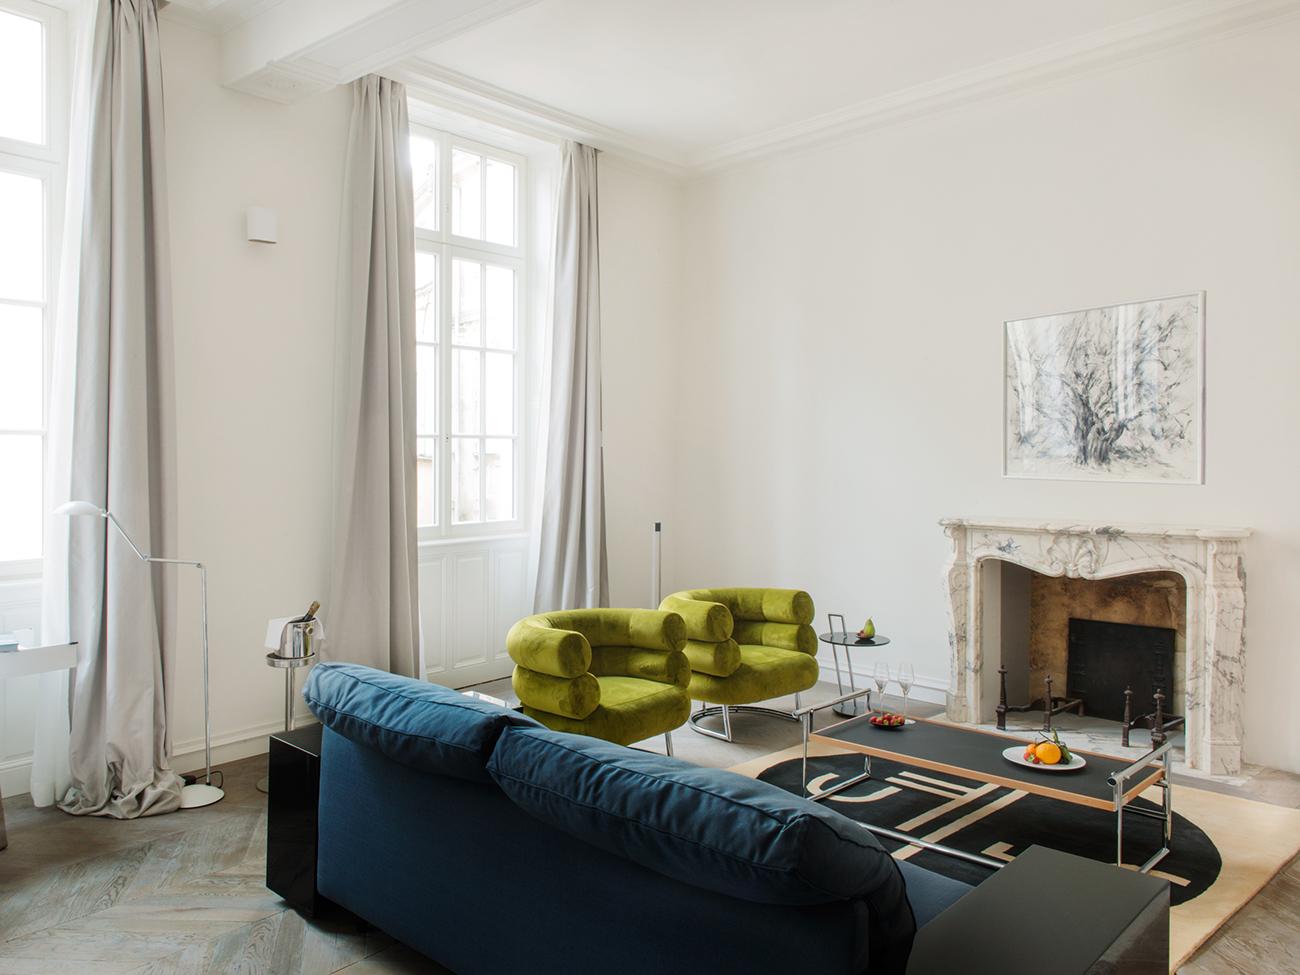 Saint-Rémy-de-Provence's Hôtel d'Almeran | Travel France